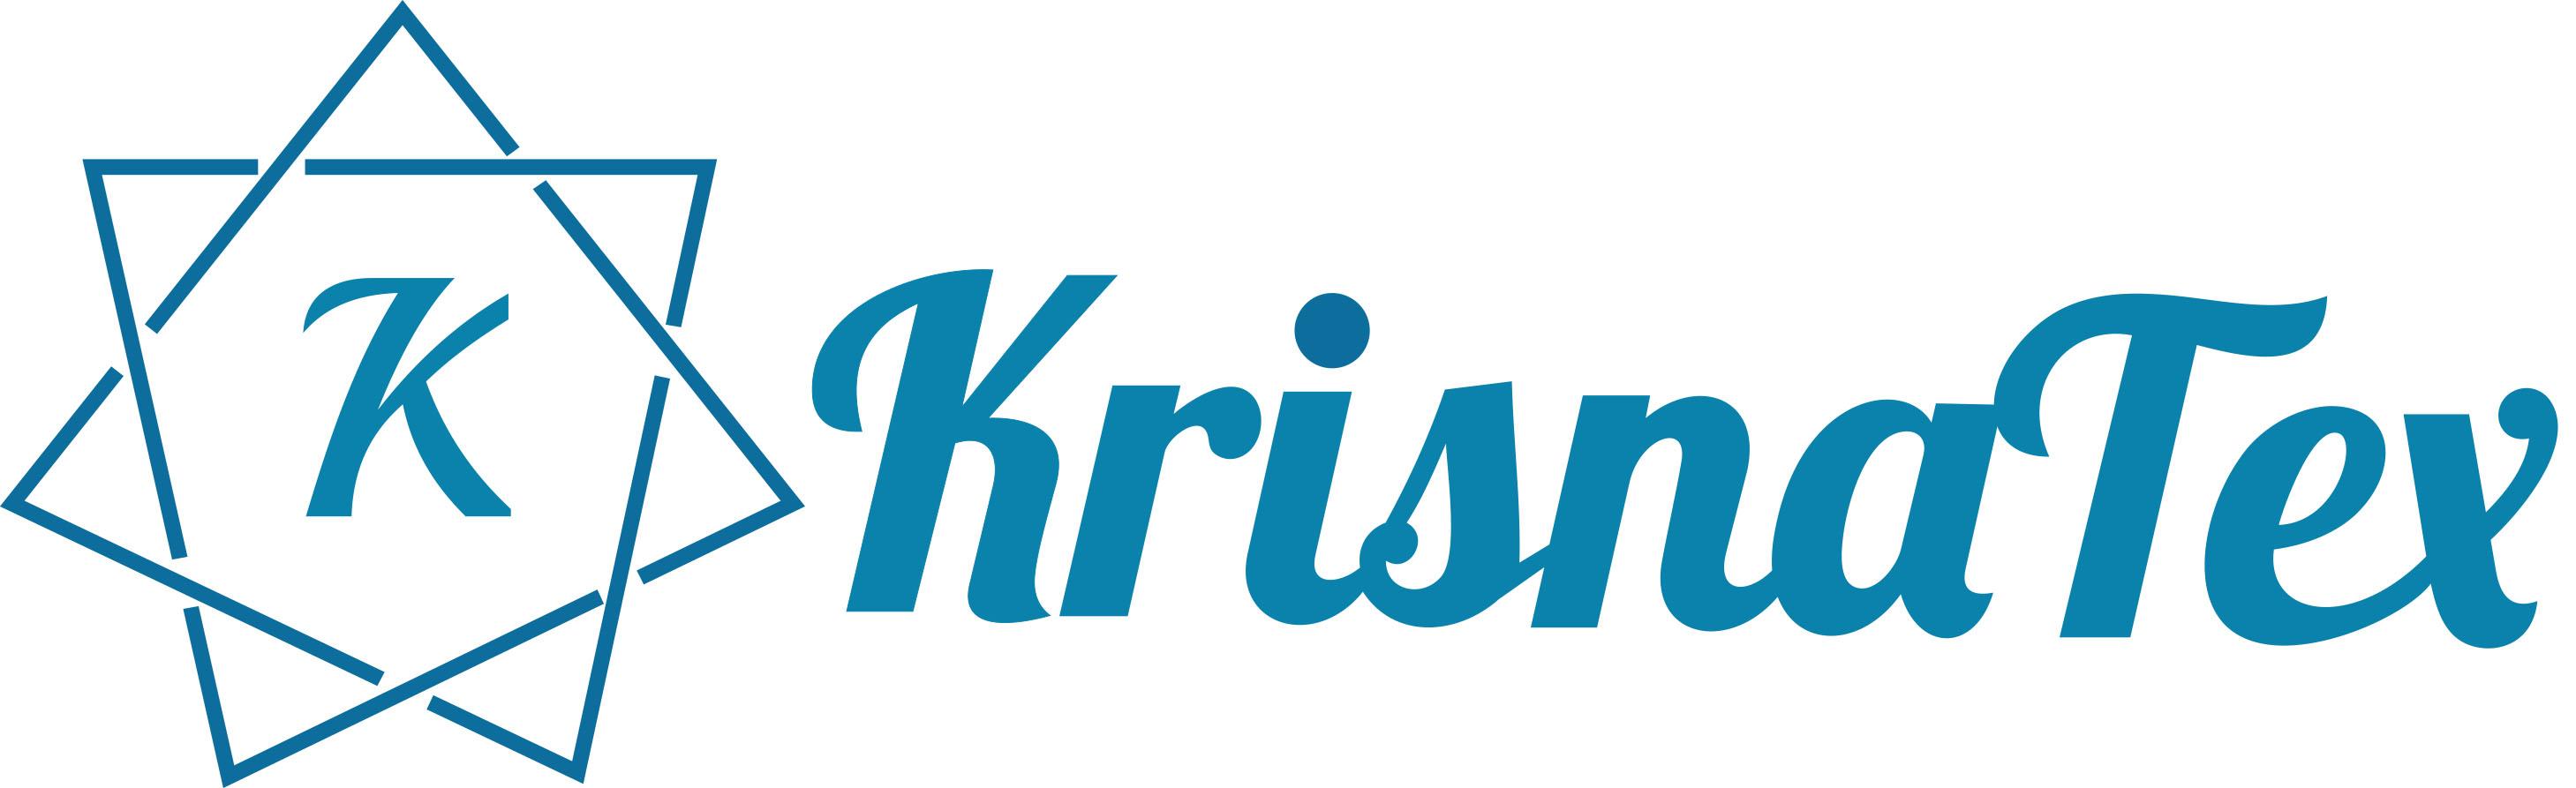 Krisnatex